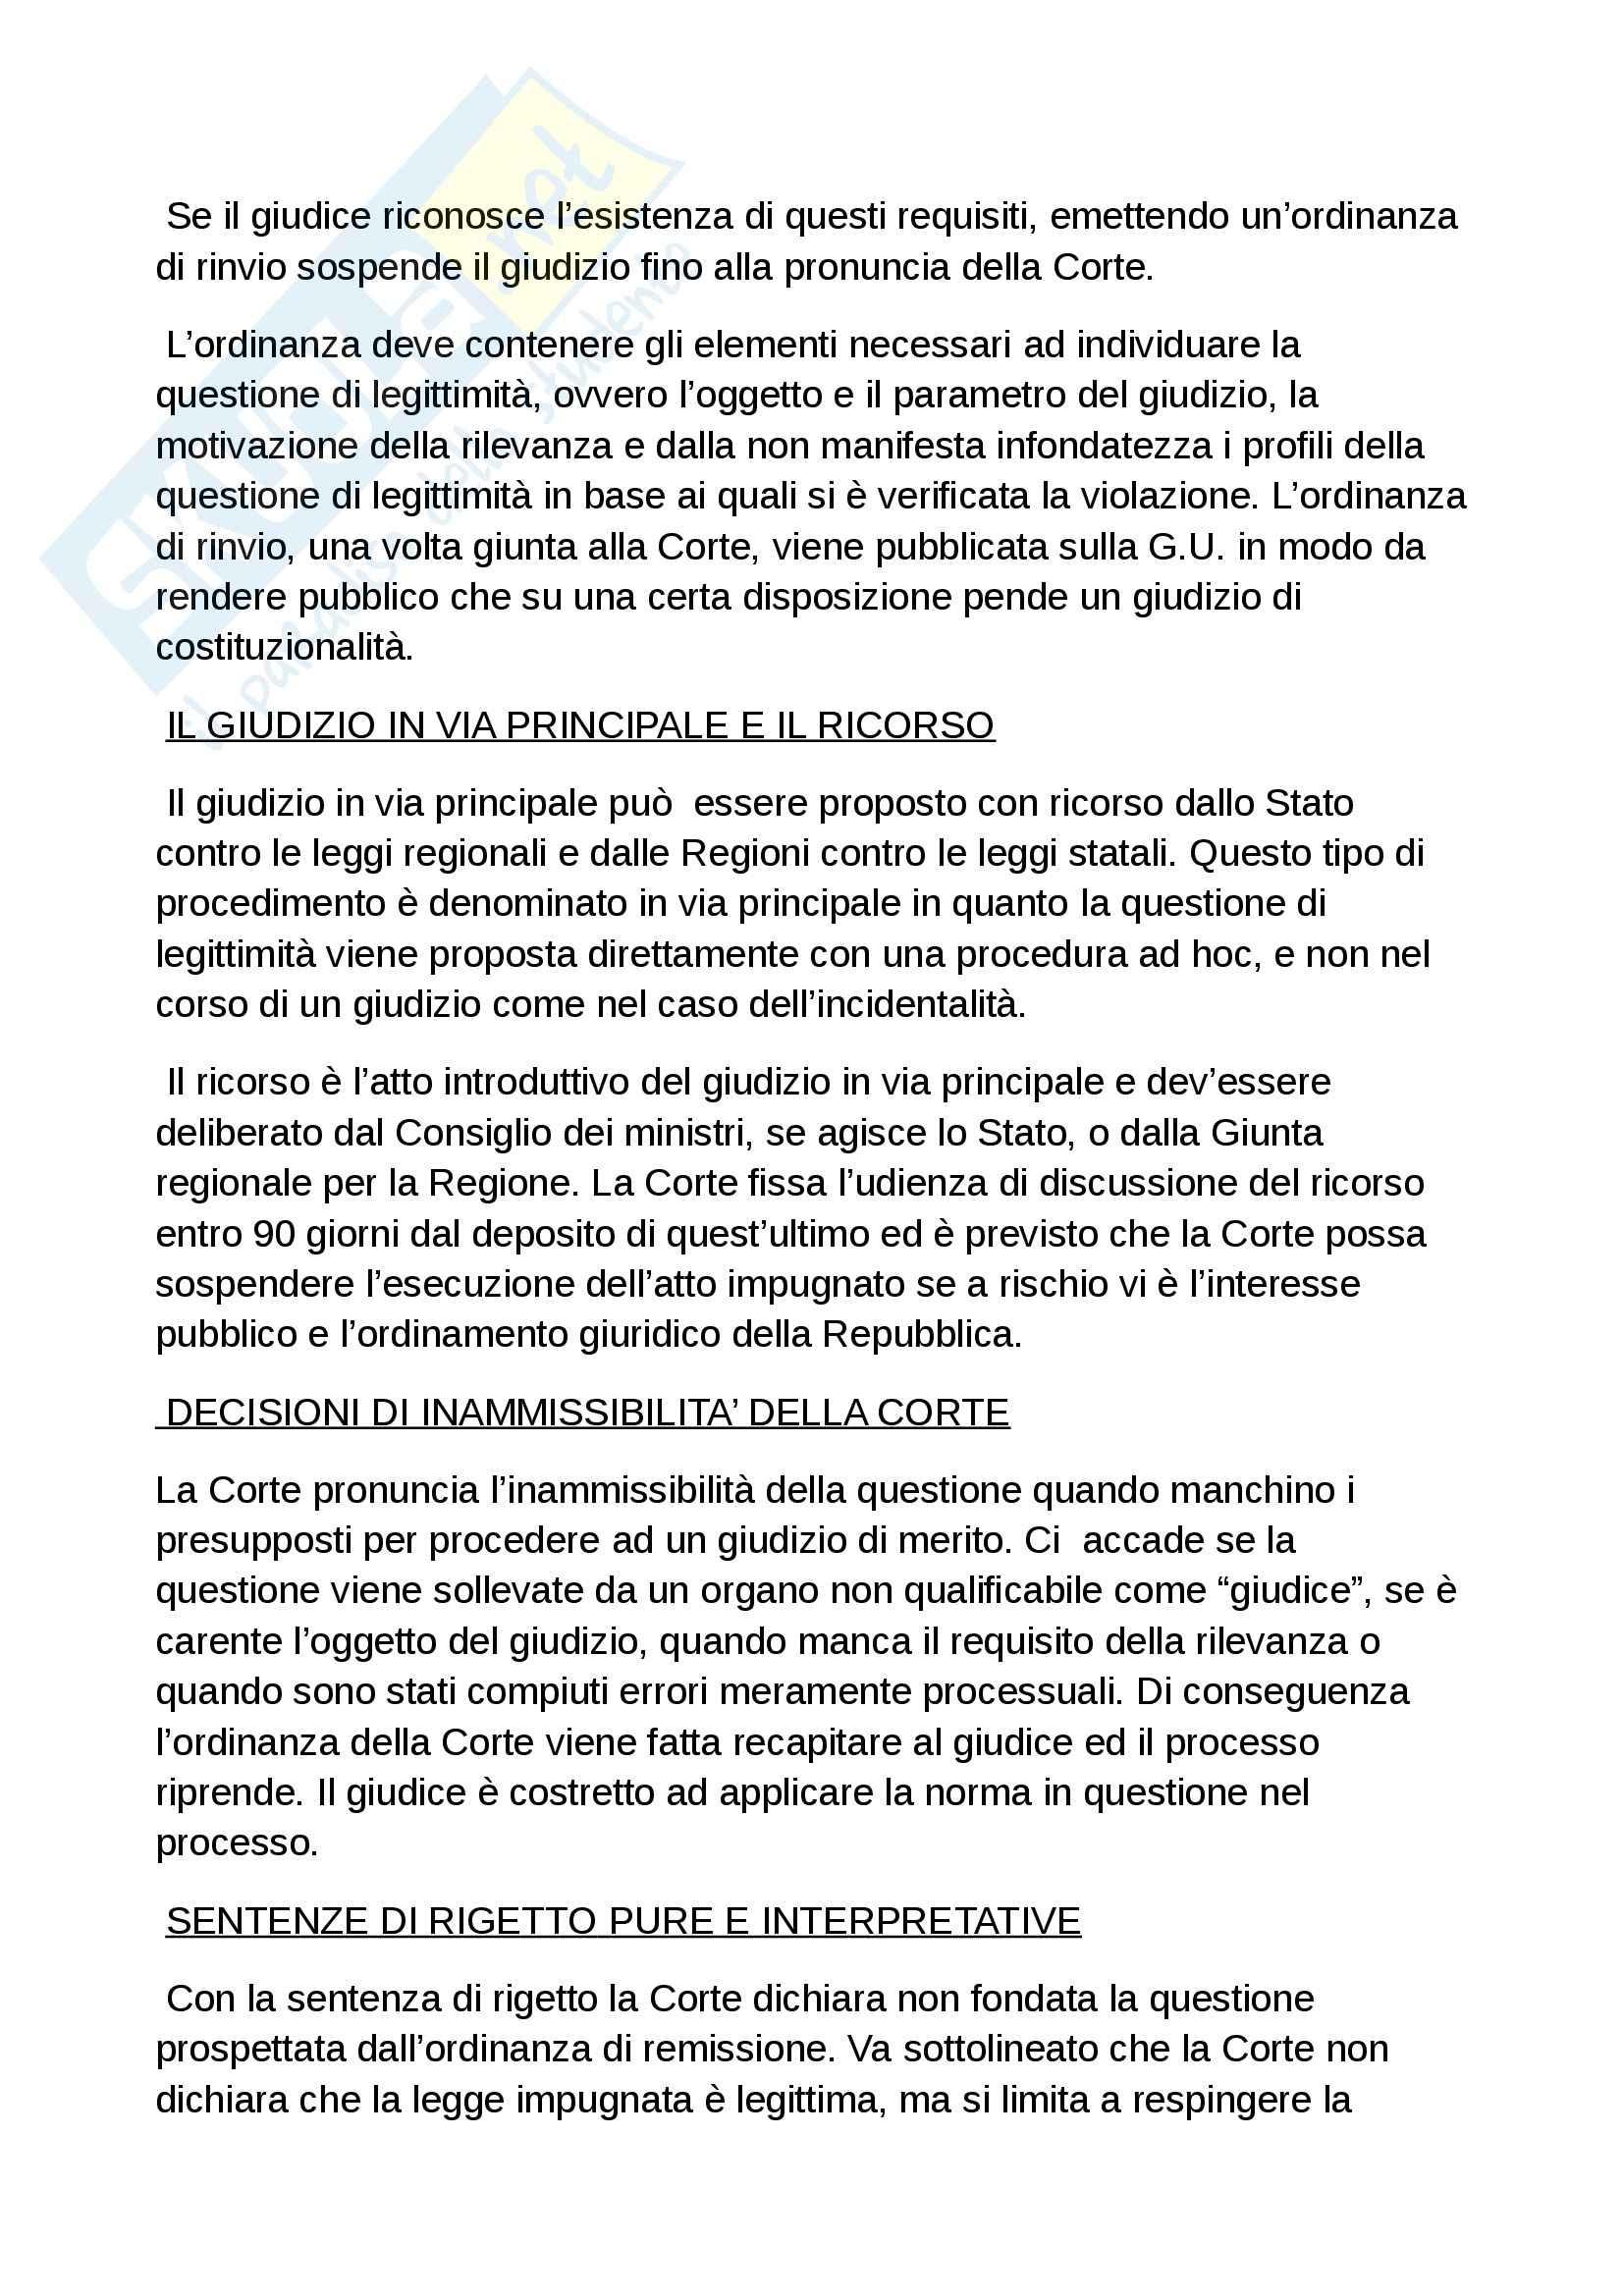 Riassunto esame diritto costituzionale, prof. Grosso, libro Diritto costituzionale, Bin, Pitruzzella Pag. 76